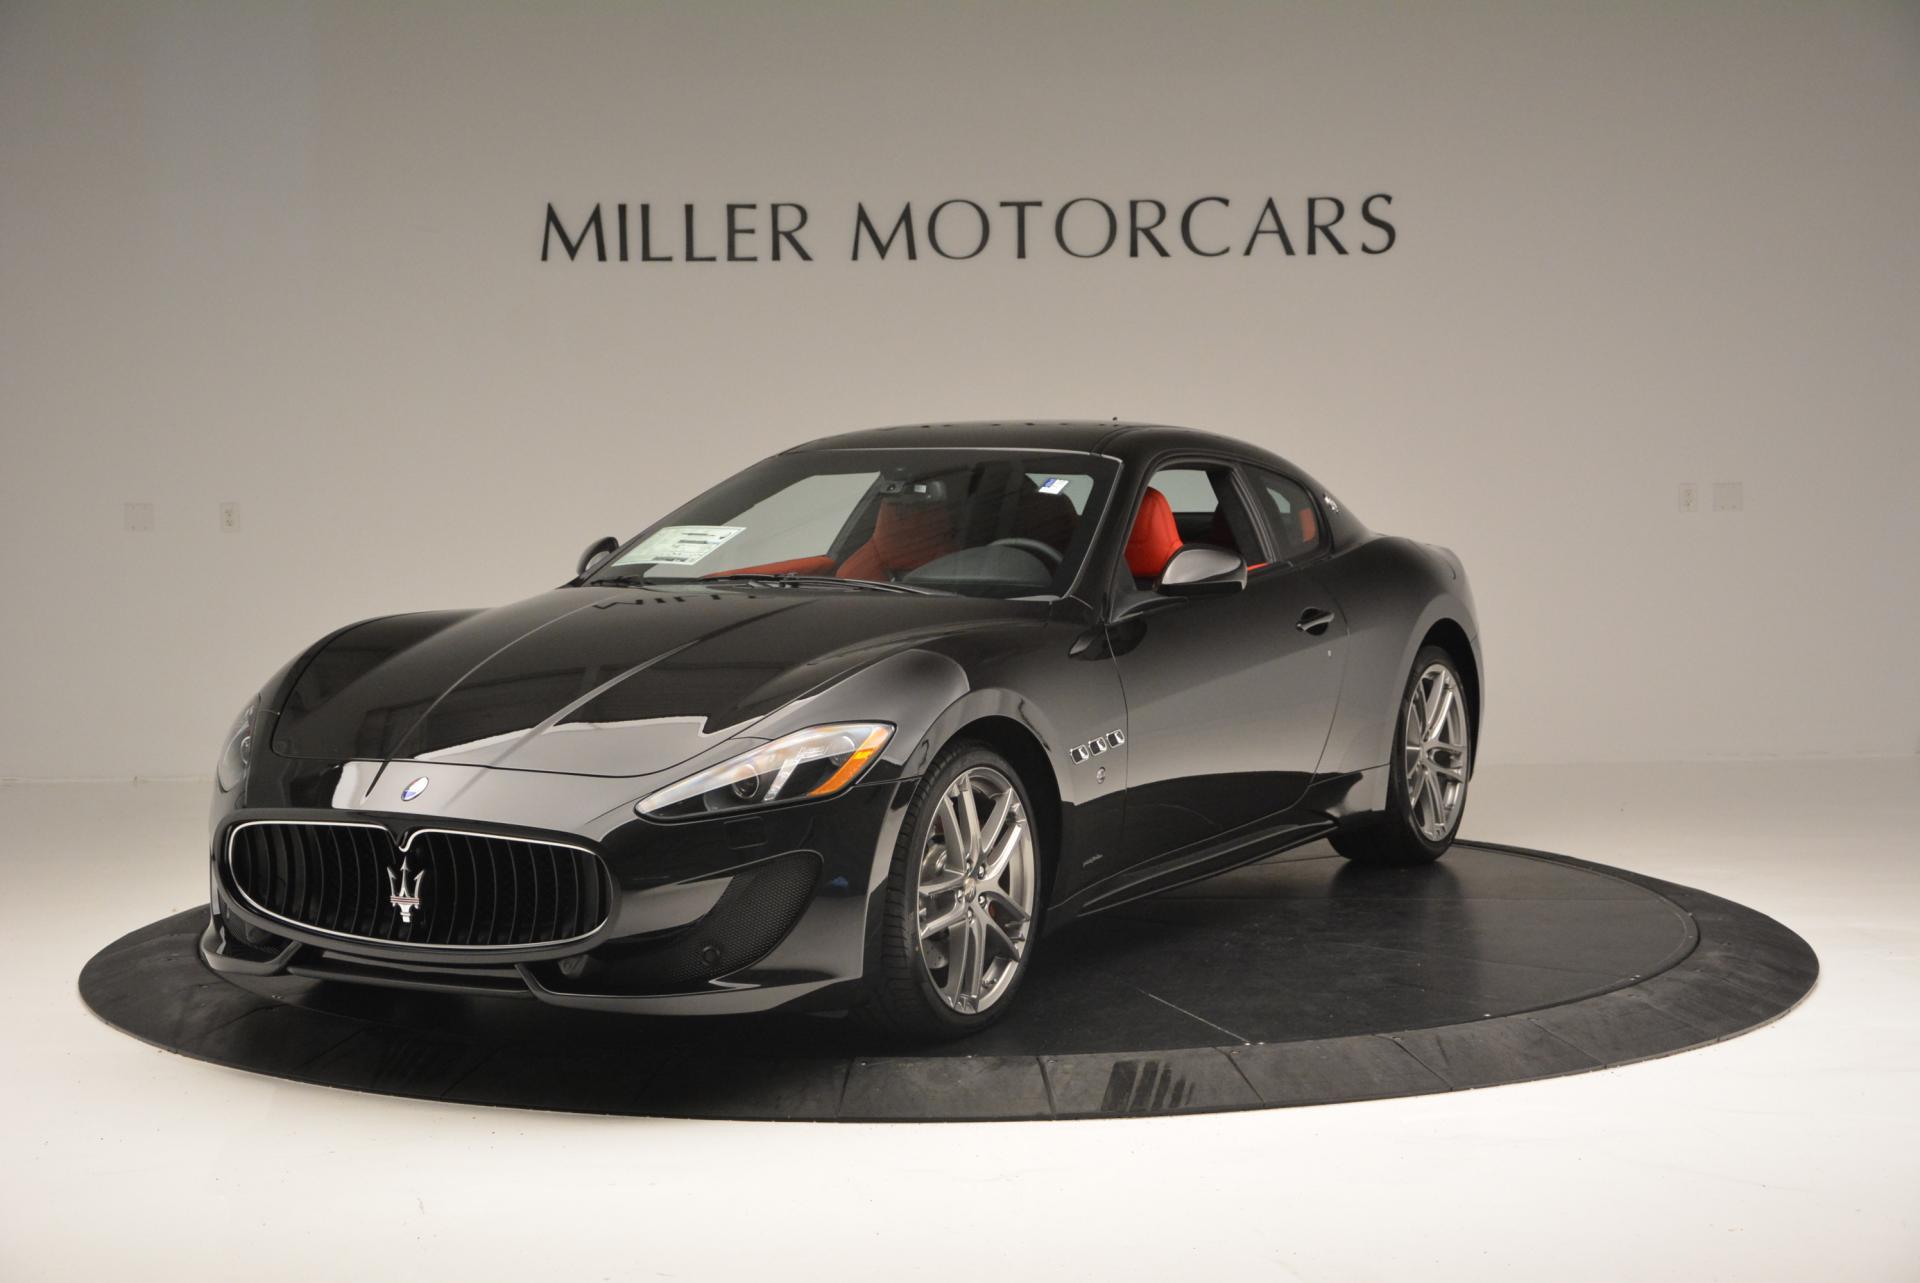 New 2016 Maserati GranTurismo Sport For Sale In Westport, CT 163_main